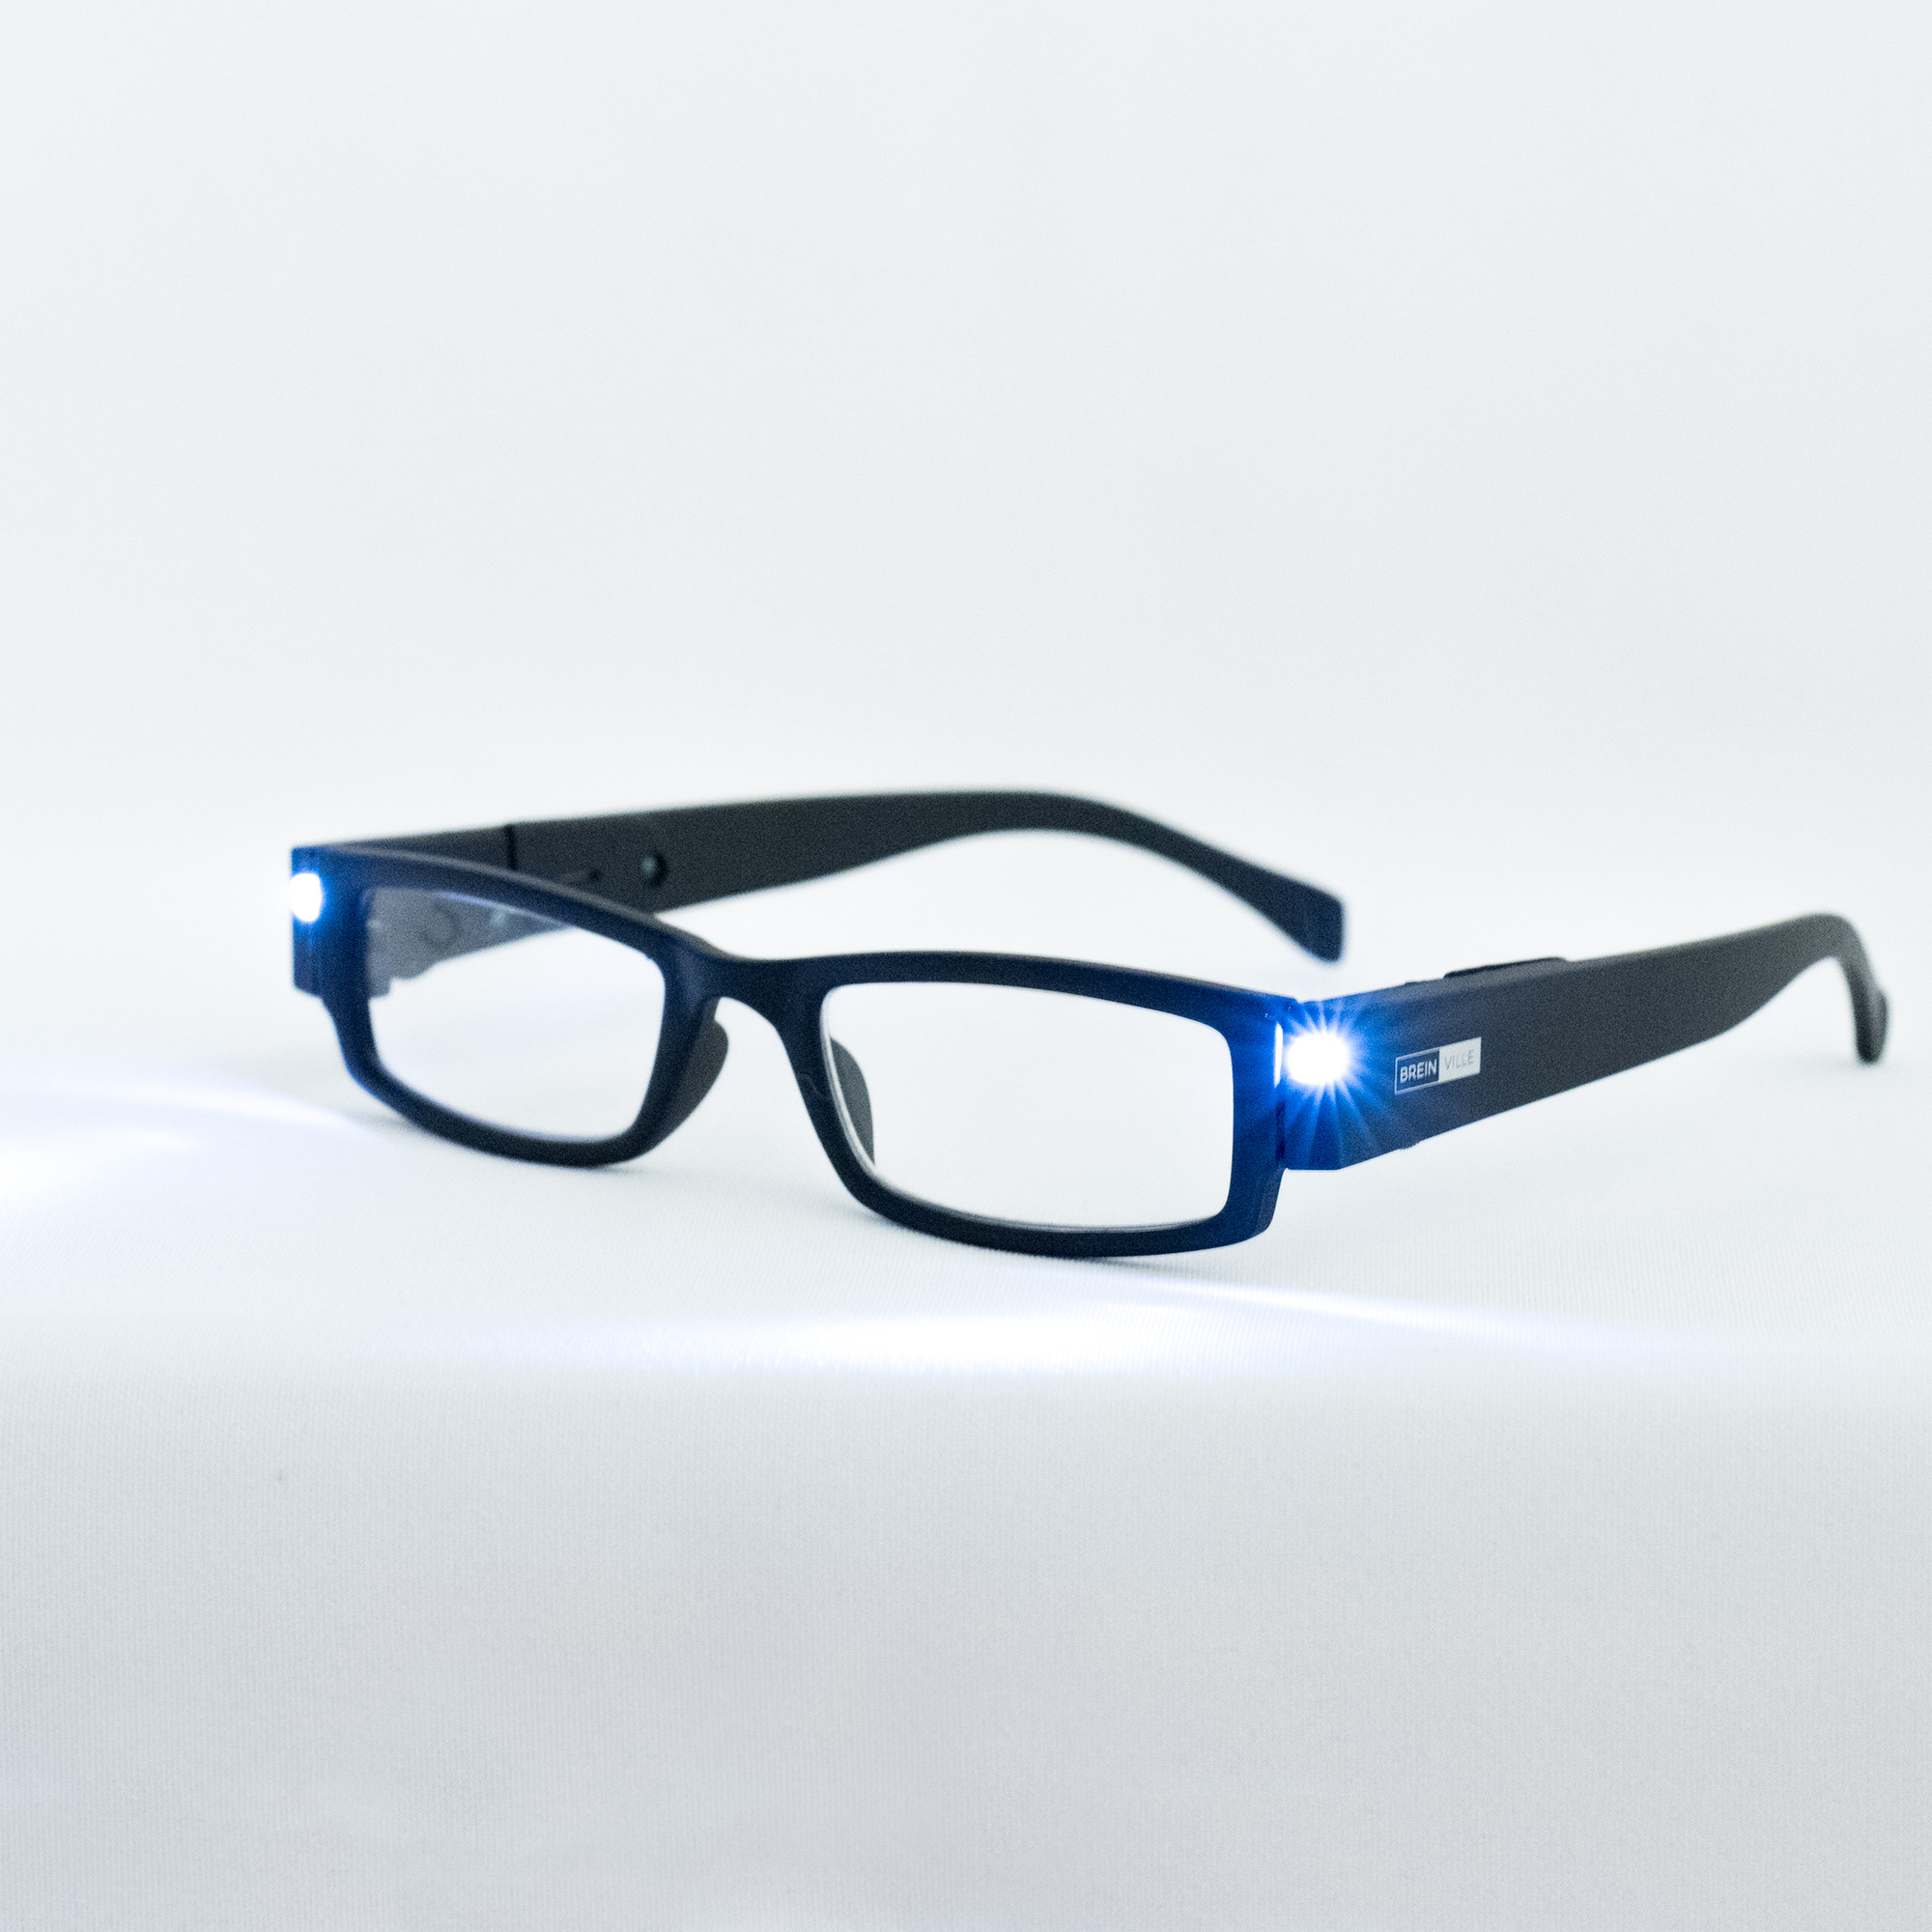 LED leesbril zwart. Leesbril met LED-verlichting.